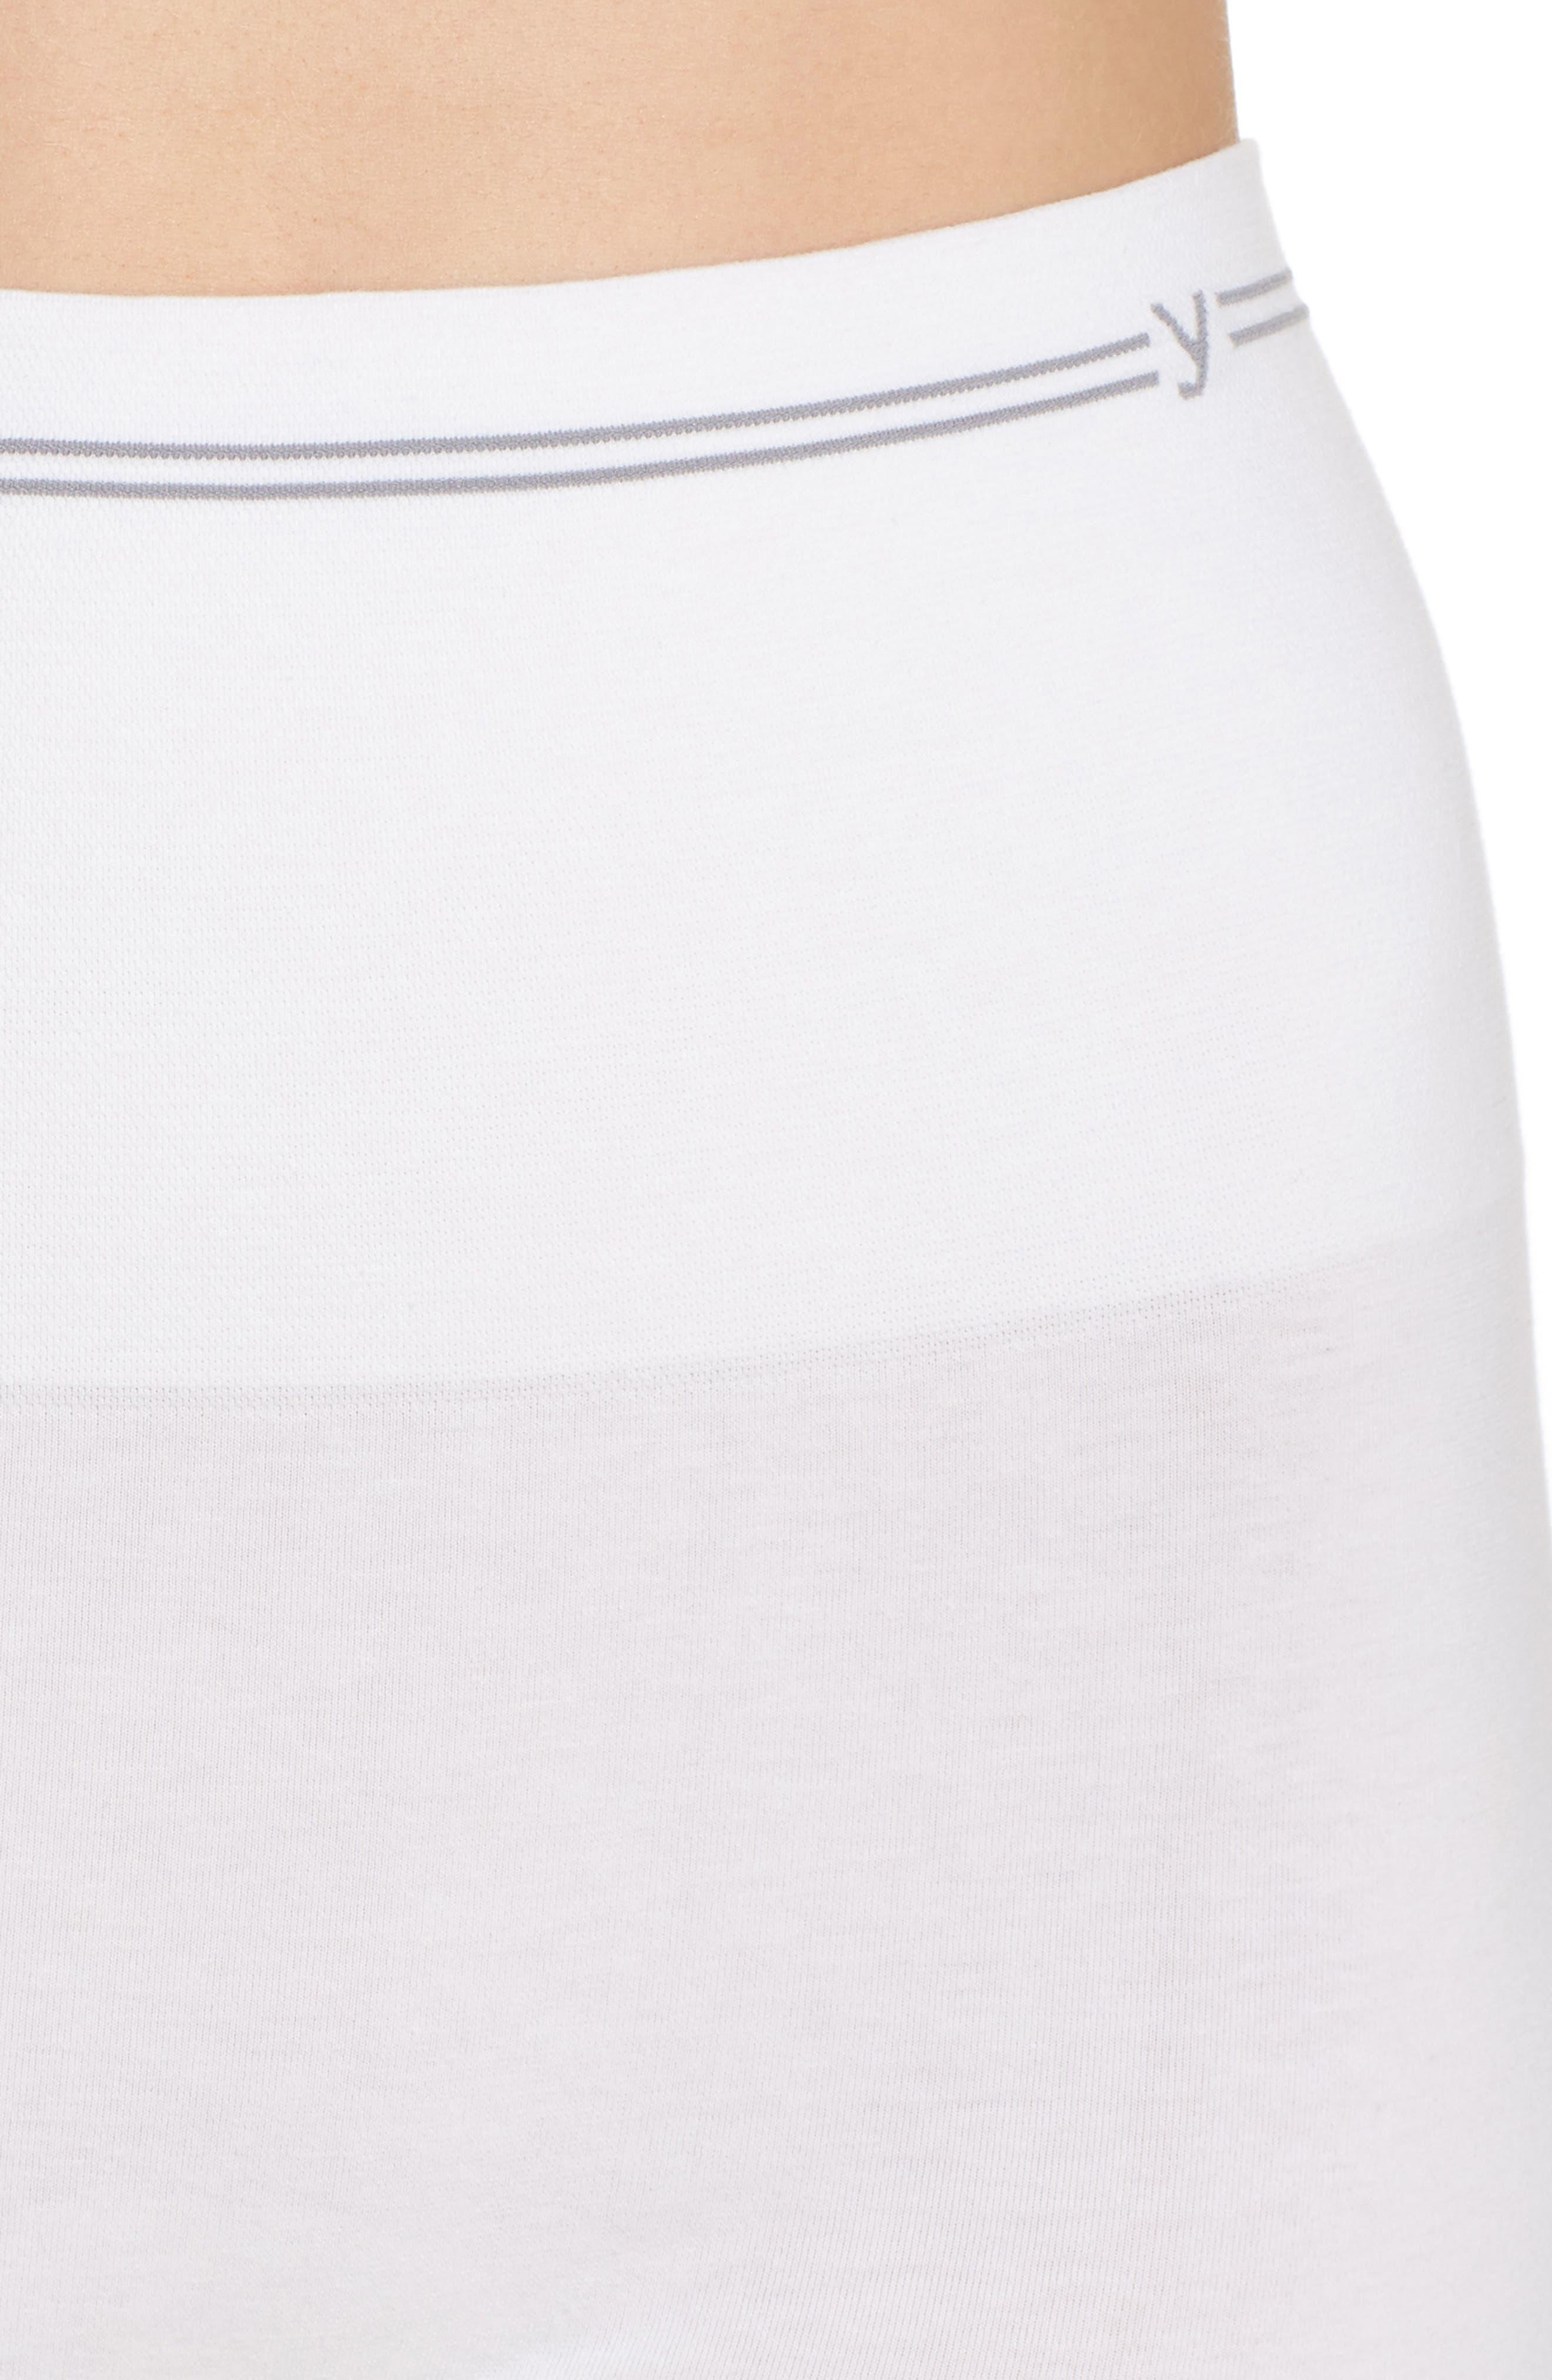 Seamless Shaping Shorts,                             Alternate thumbnail 6, color,                             White